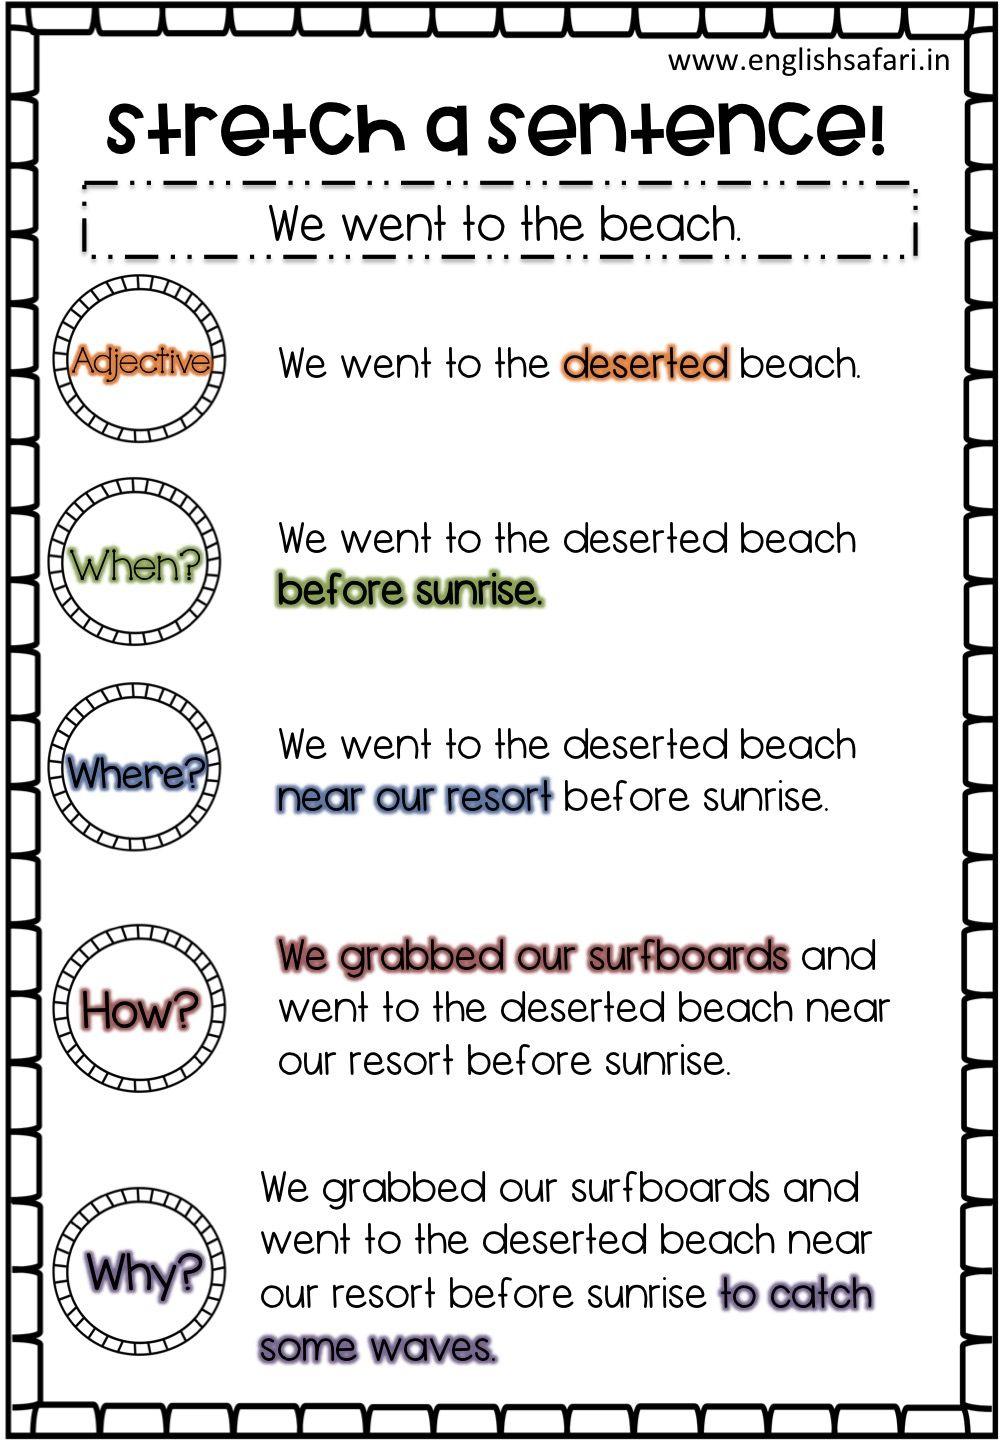 Free Stretch A Sentence Www Englishsafari In In 2020 Third Grade Writing First Grade Writing Writing Sentences Worksheets